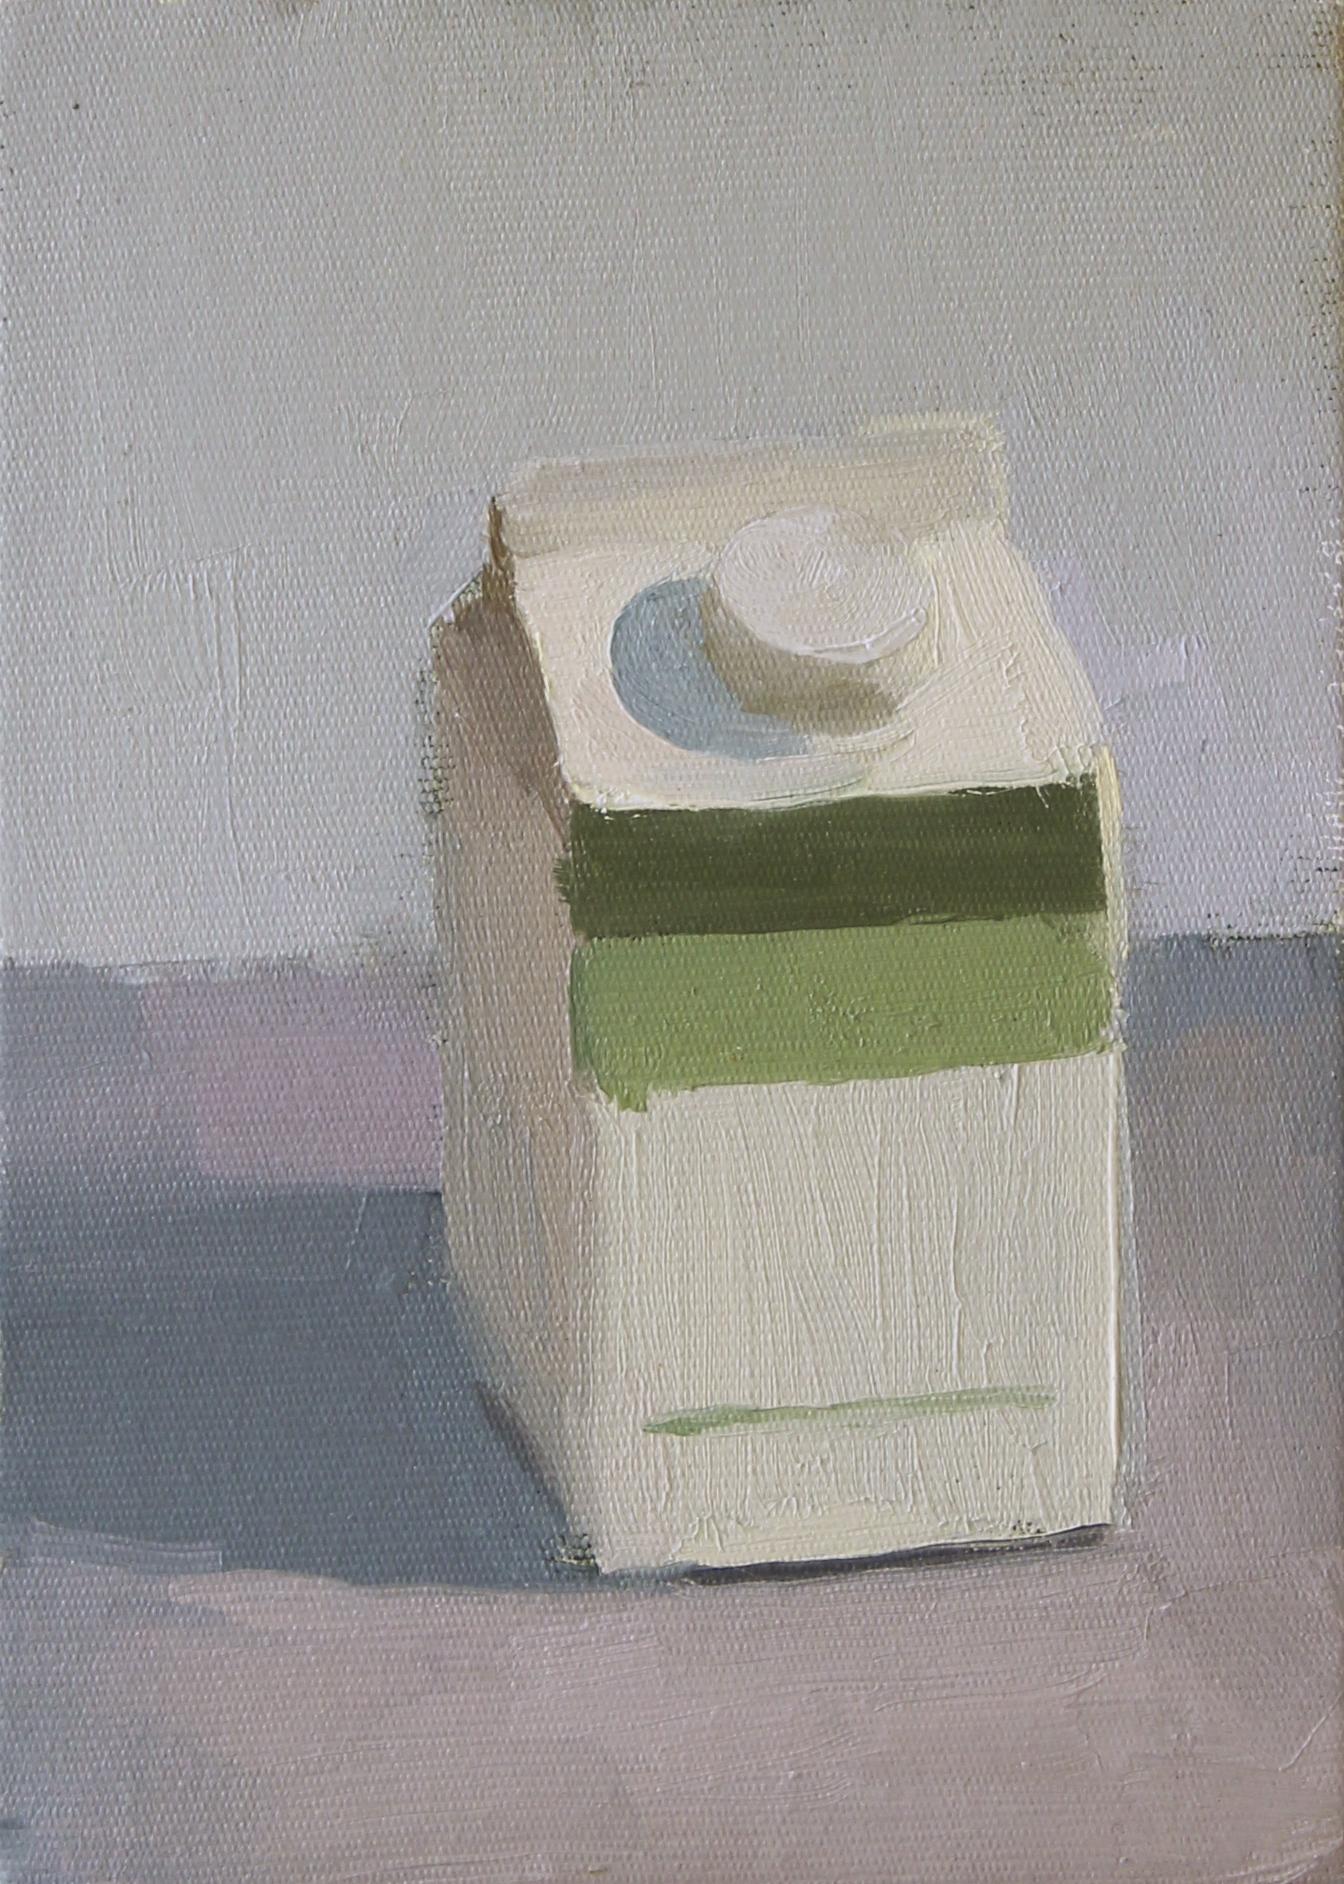 "half & half   oil on canvas  5x7""  2012"